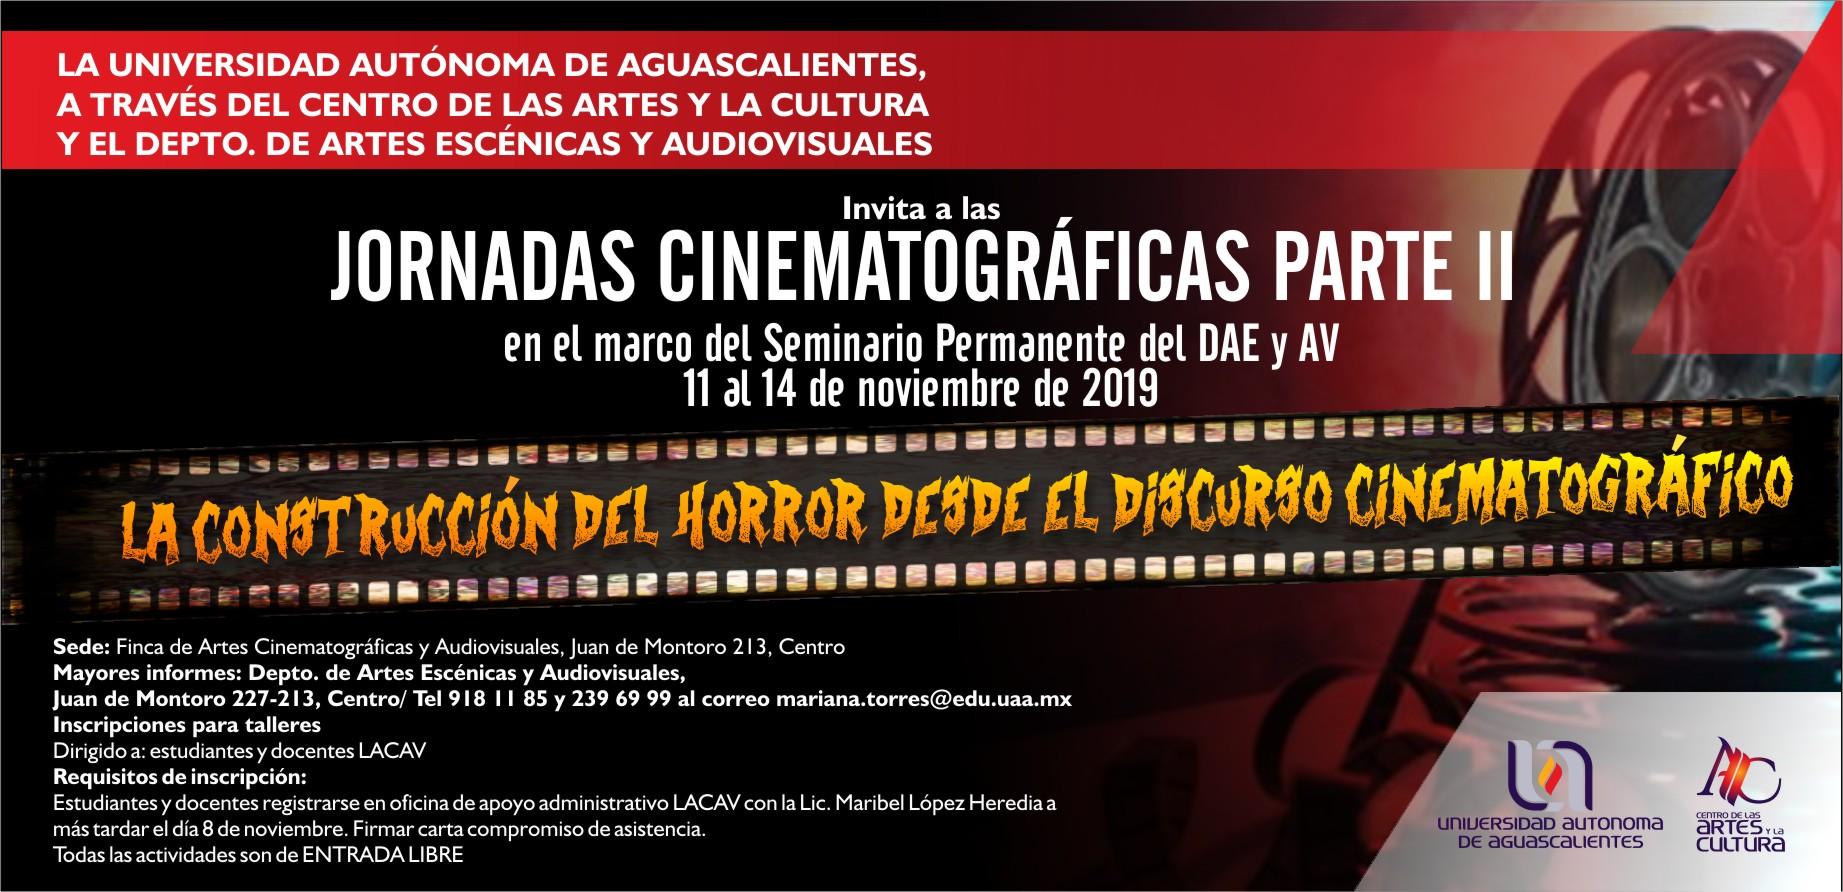 JORNADAS CINEMATOGRÁFICAS PARTE II